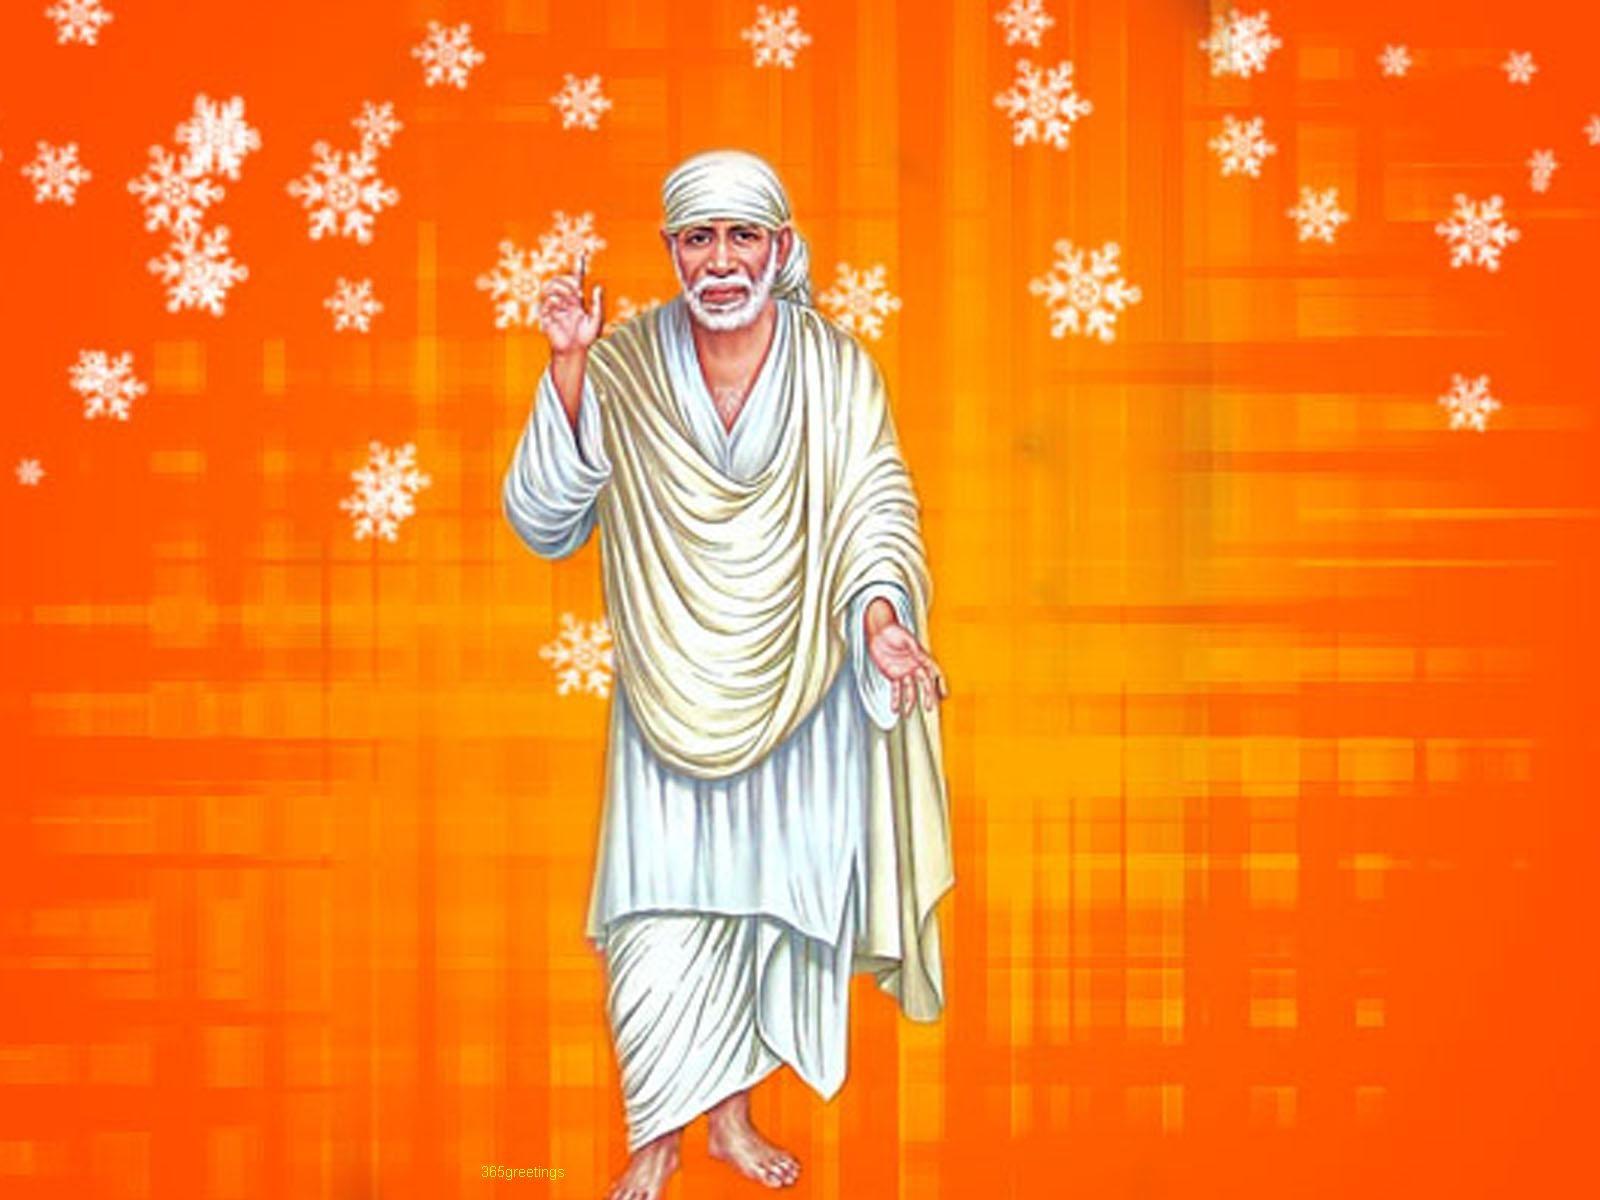 Om Sai Ram Bharathiyam Https Play Google Com Store Apps Details Id Com App Devotion Hl En Https Itunes A Sai Baba Wallpapers Sai Baba Hd Wallpaper 1080p